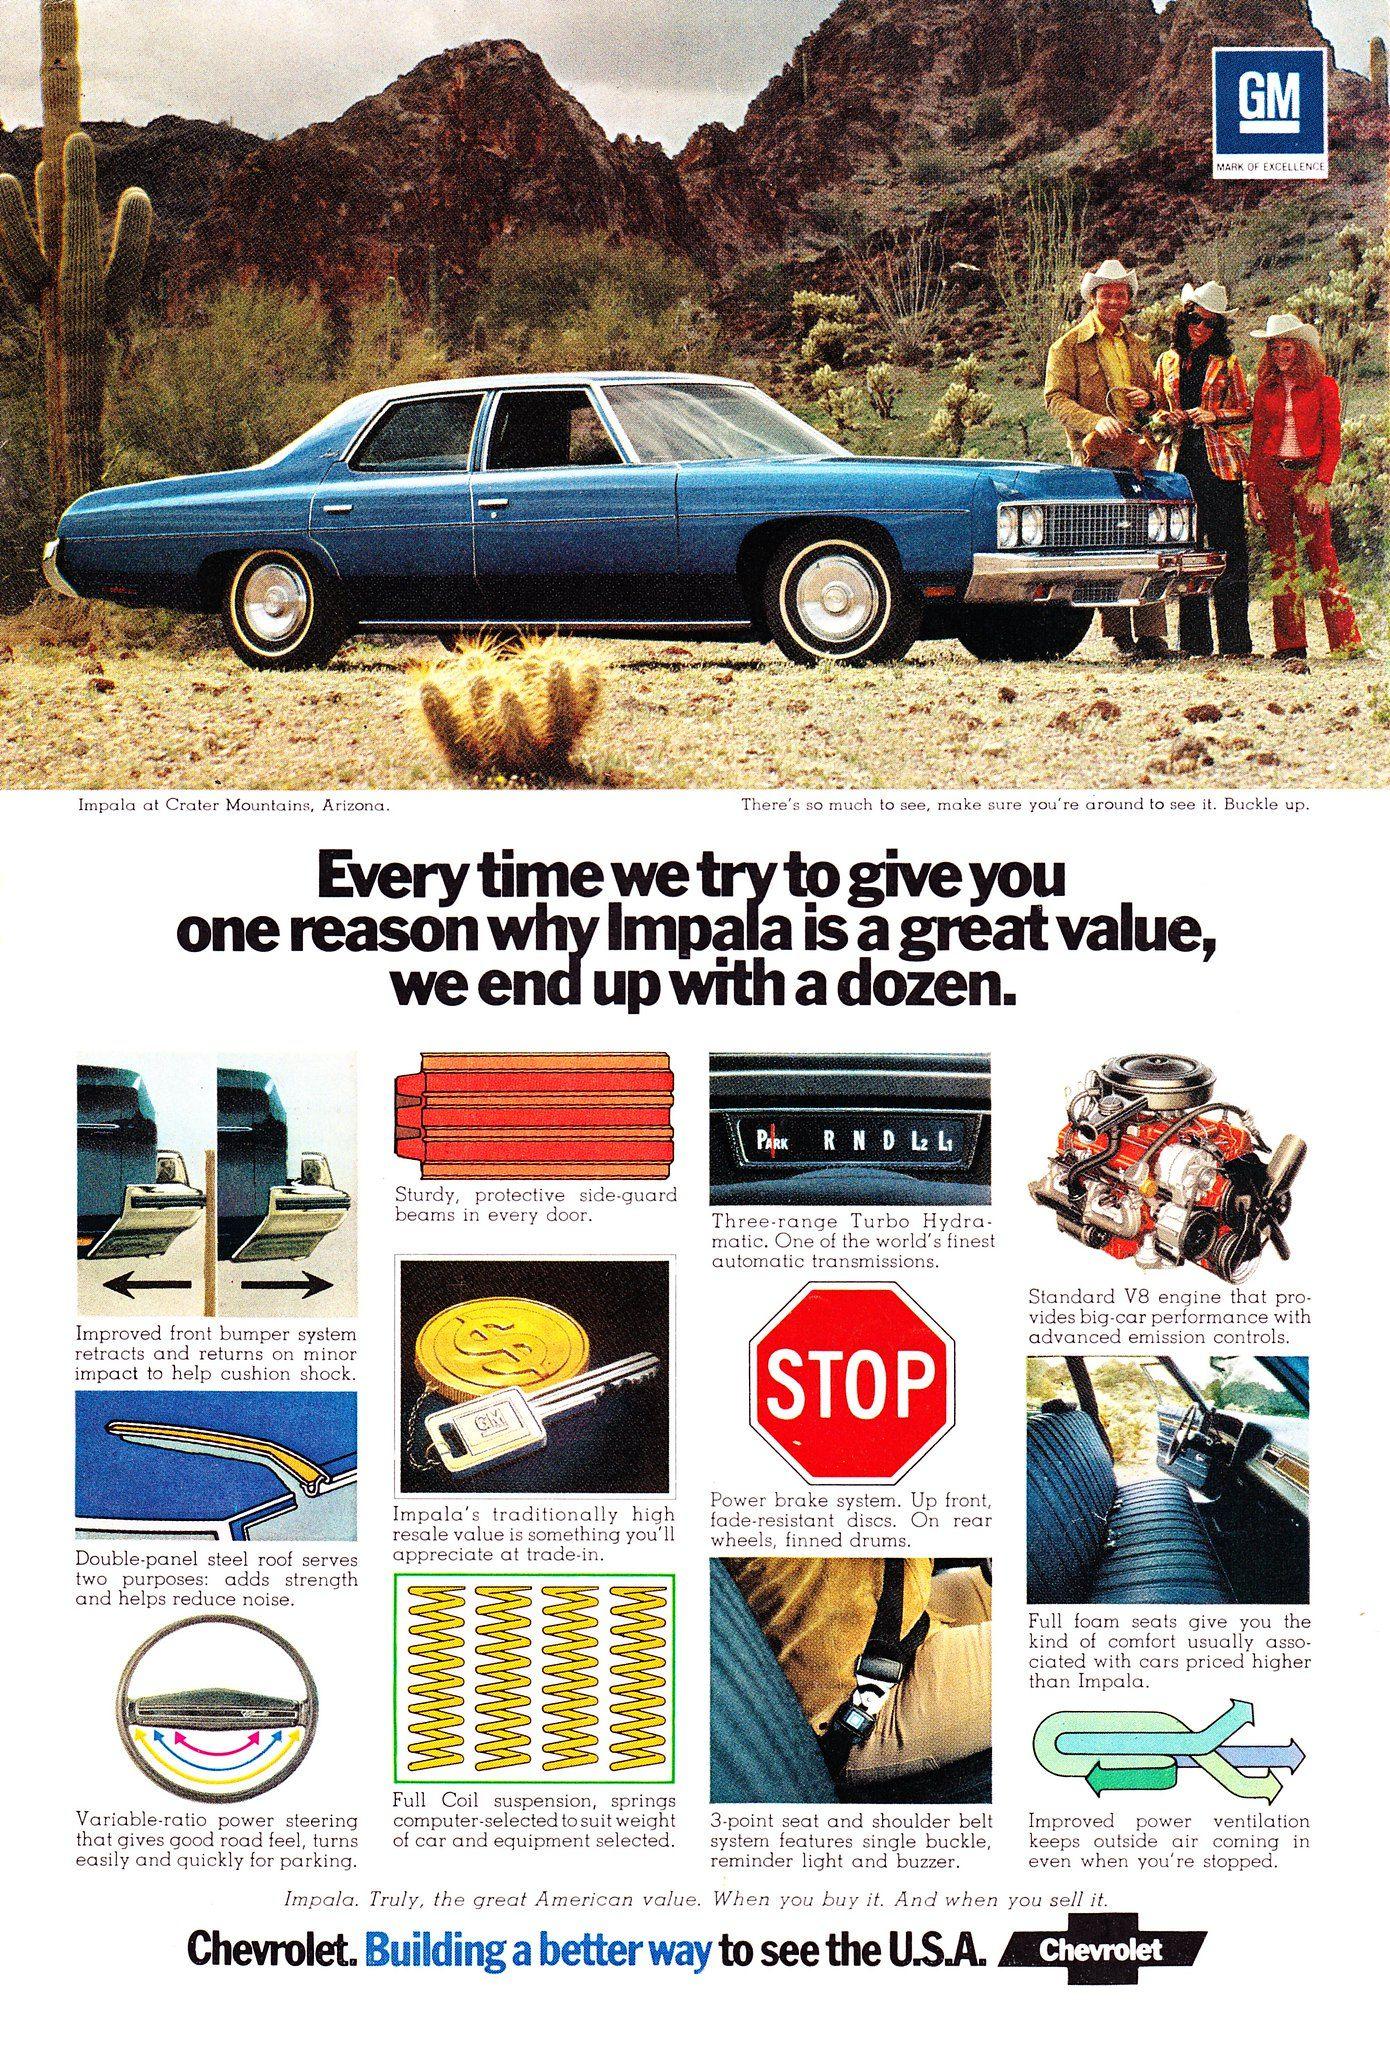 1973 Chevrolet Impala 4 Door Sedan Usa Original Magazine Advertisement Chevrolet Impala Impala Chevrolet